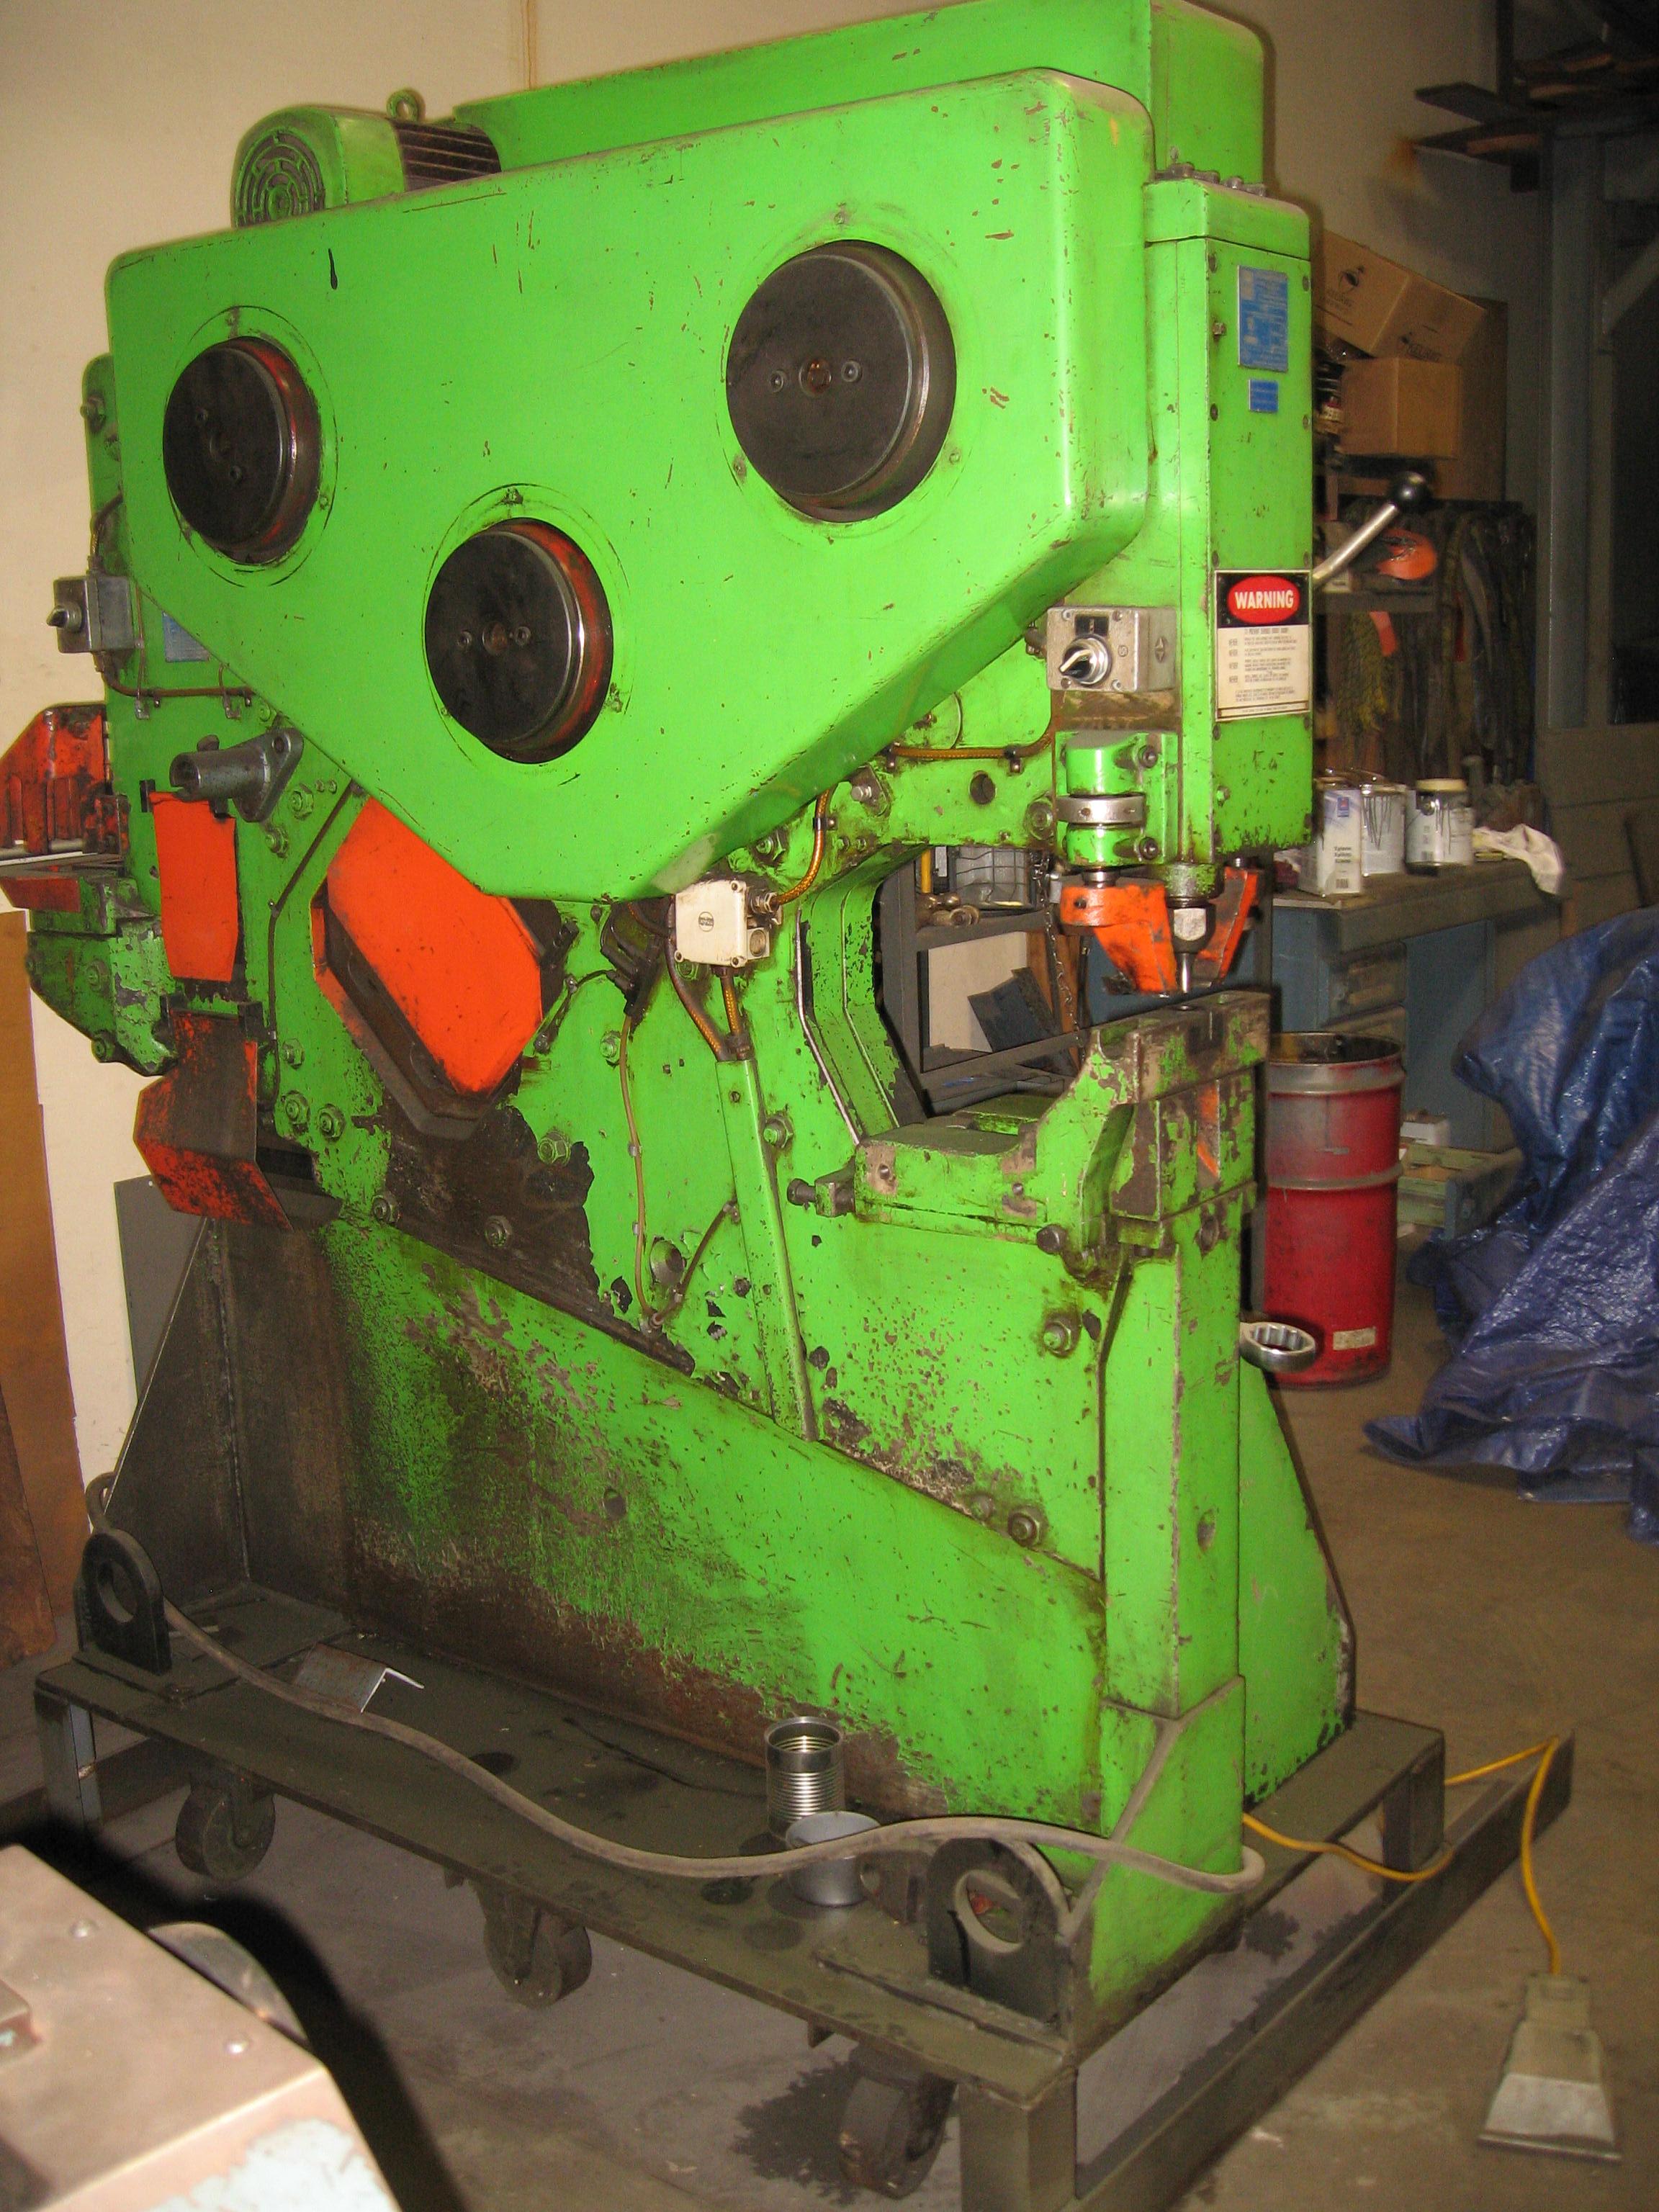 Mubea Optima Kbl 71 Mechanical Ironworker  71 Ton Punch  5